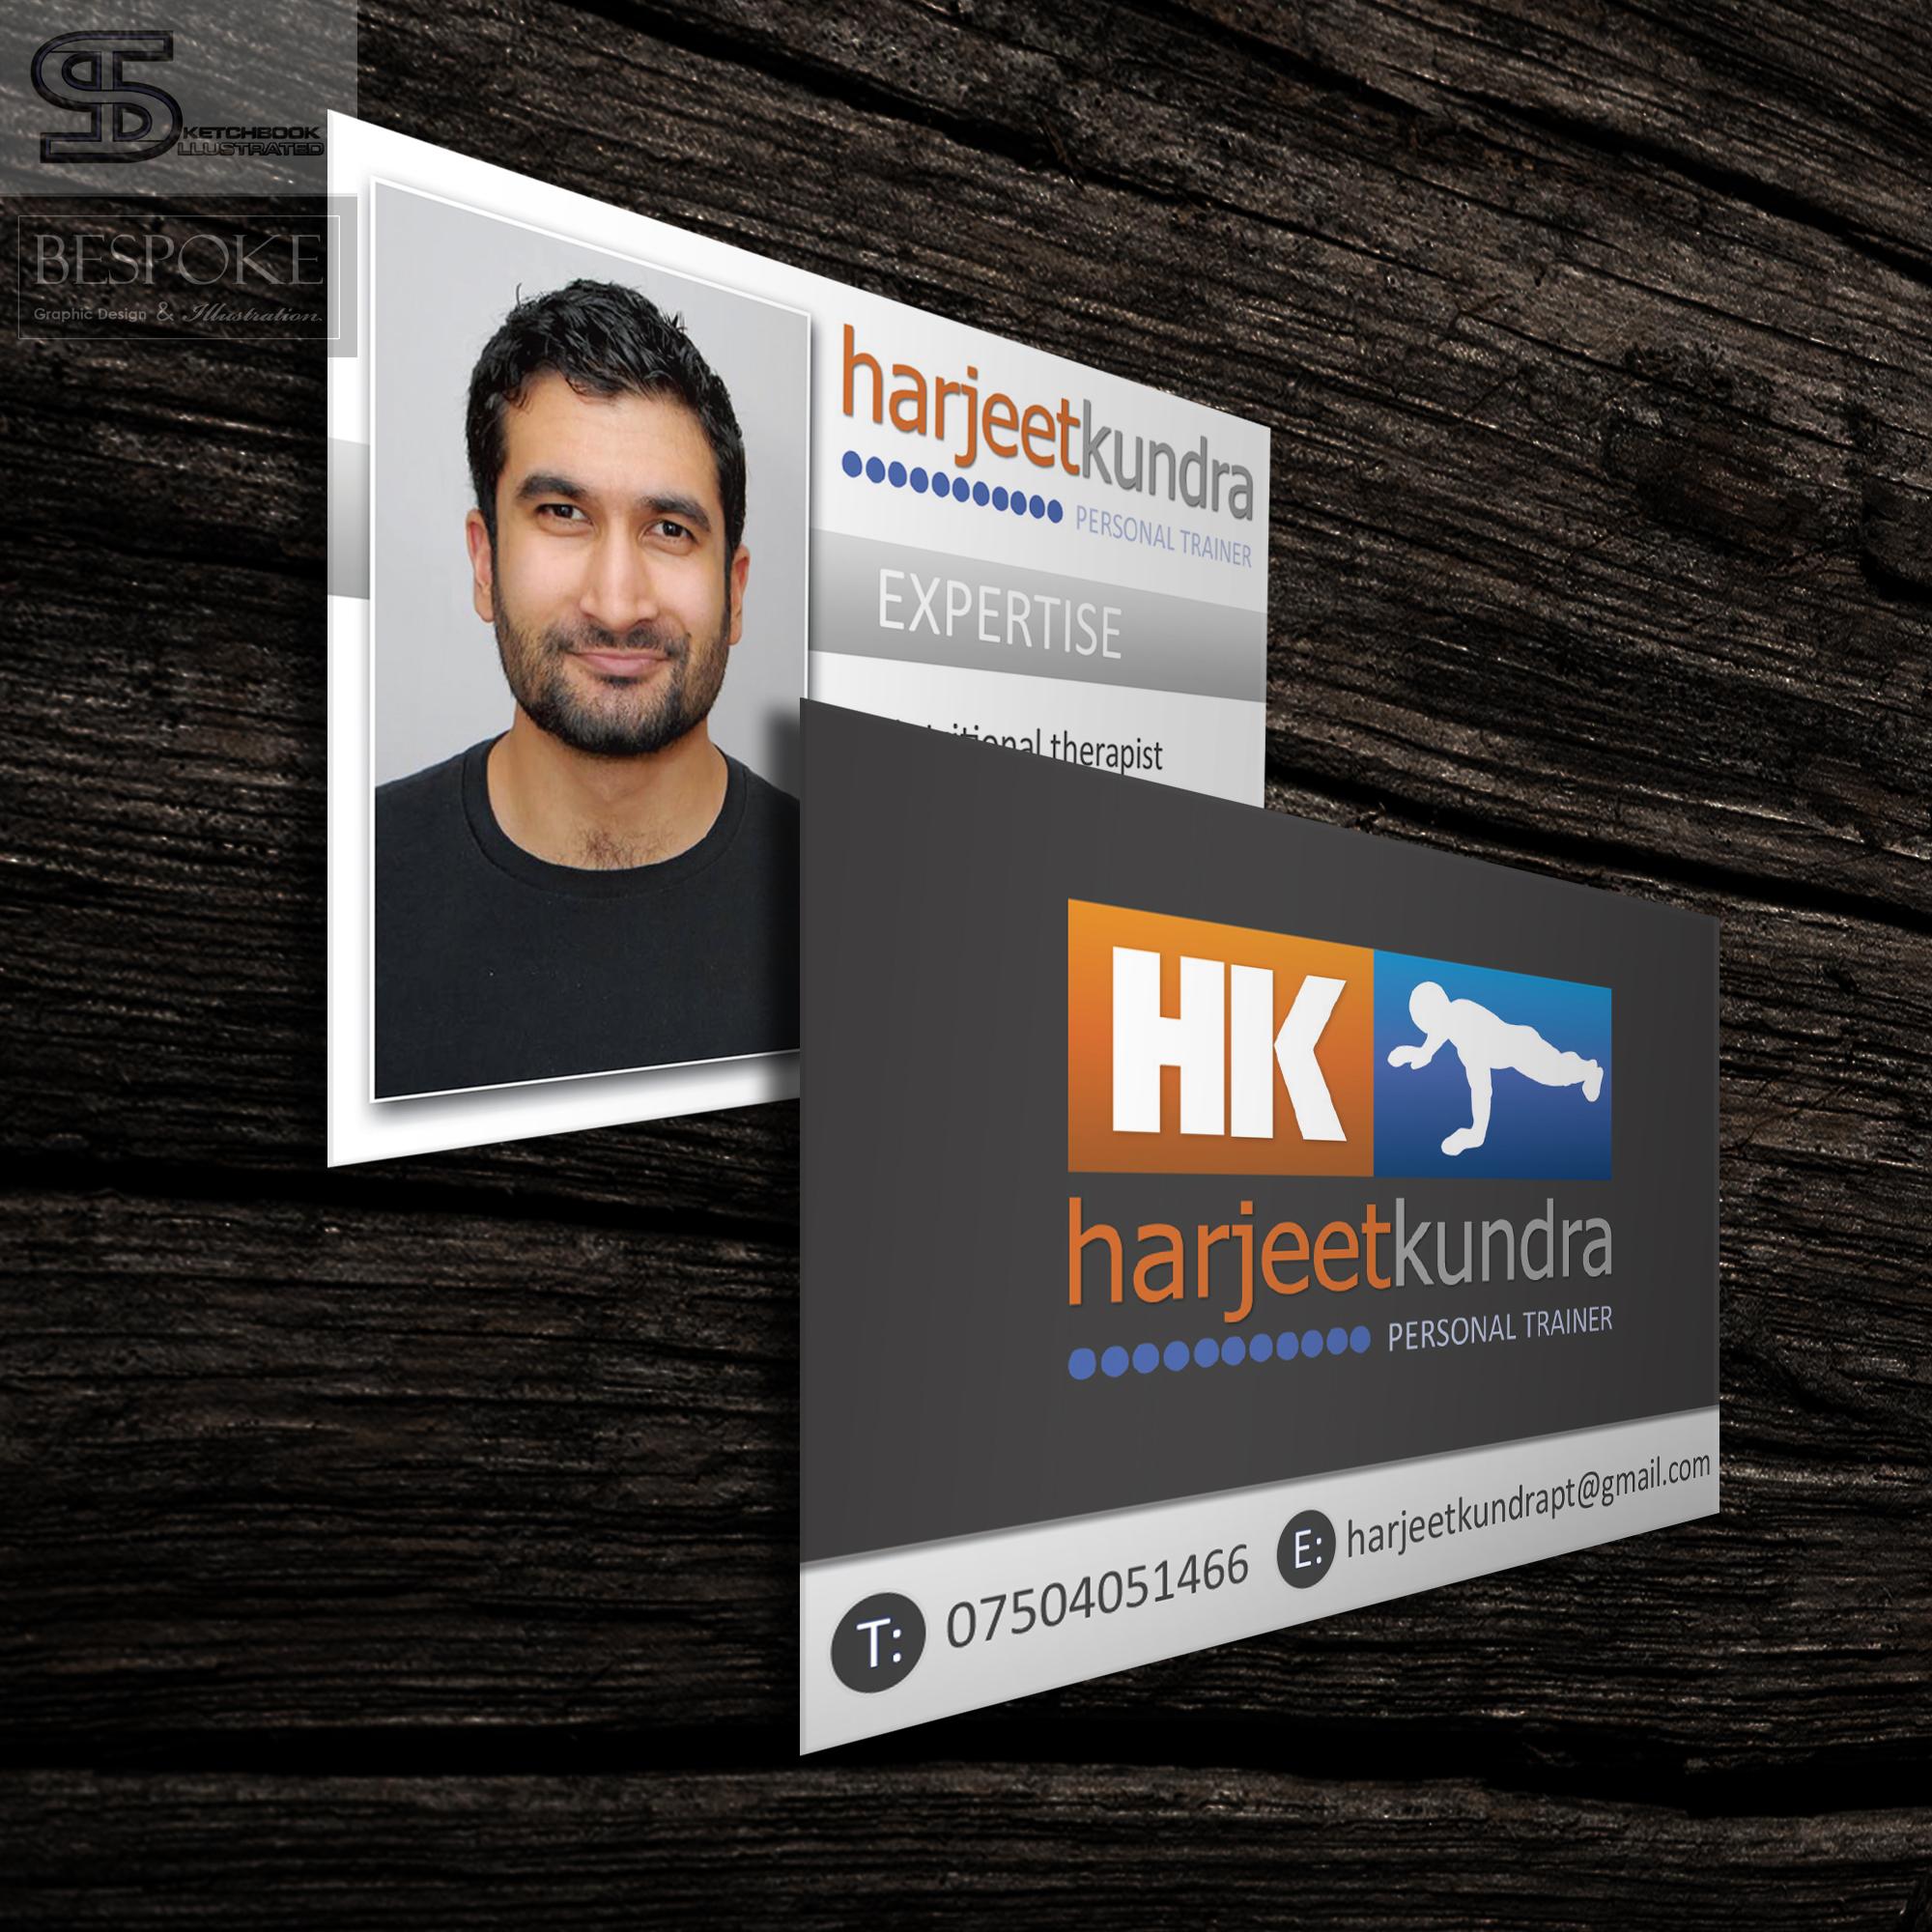 harjeet kundra personal trainer business cards sketchbook